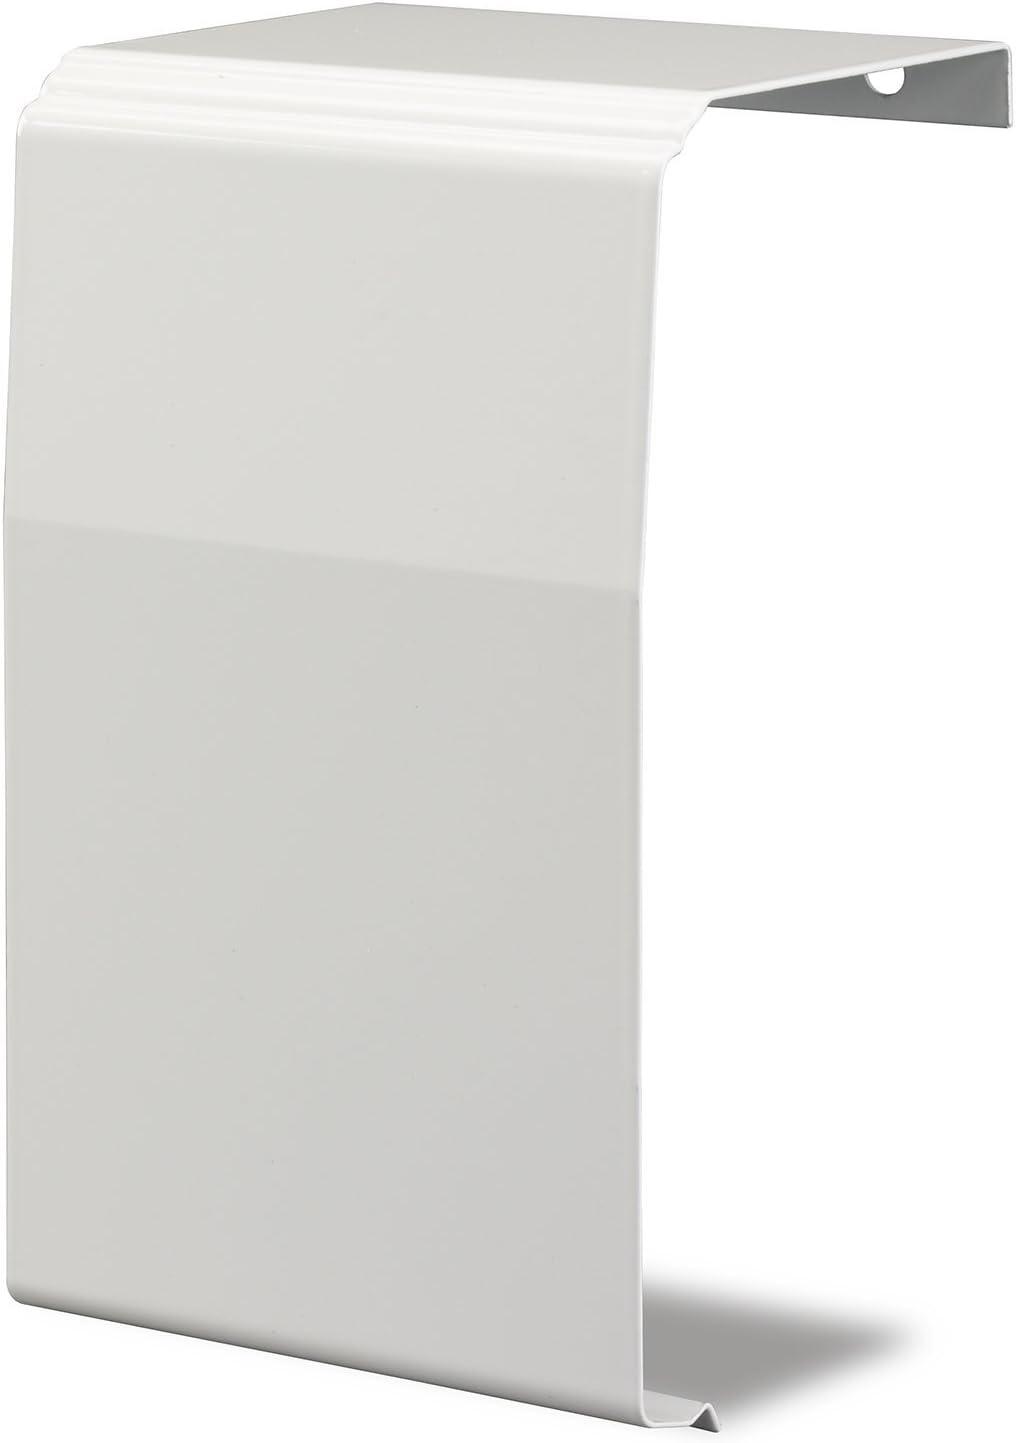 Revital/Line Filler Sleeve for Slant/Fin Baseboard Heater Cover in Brite White